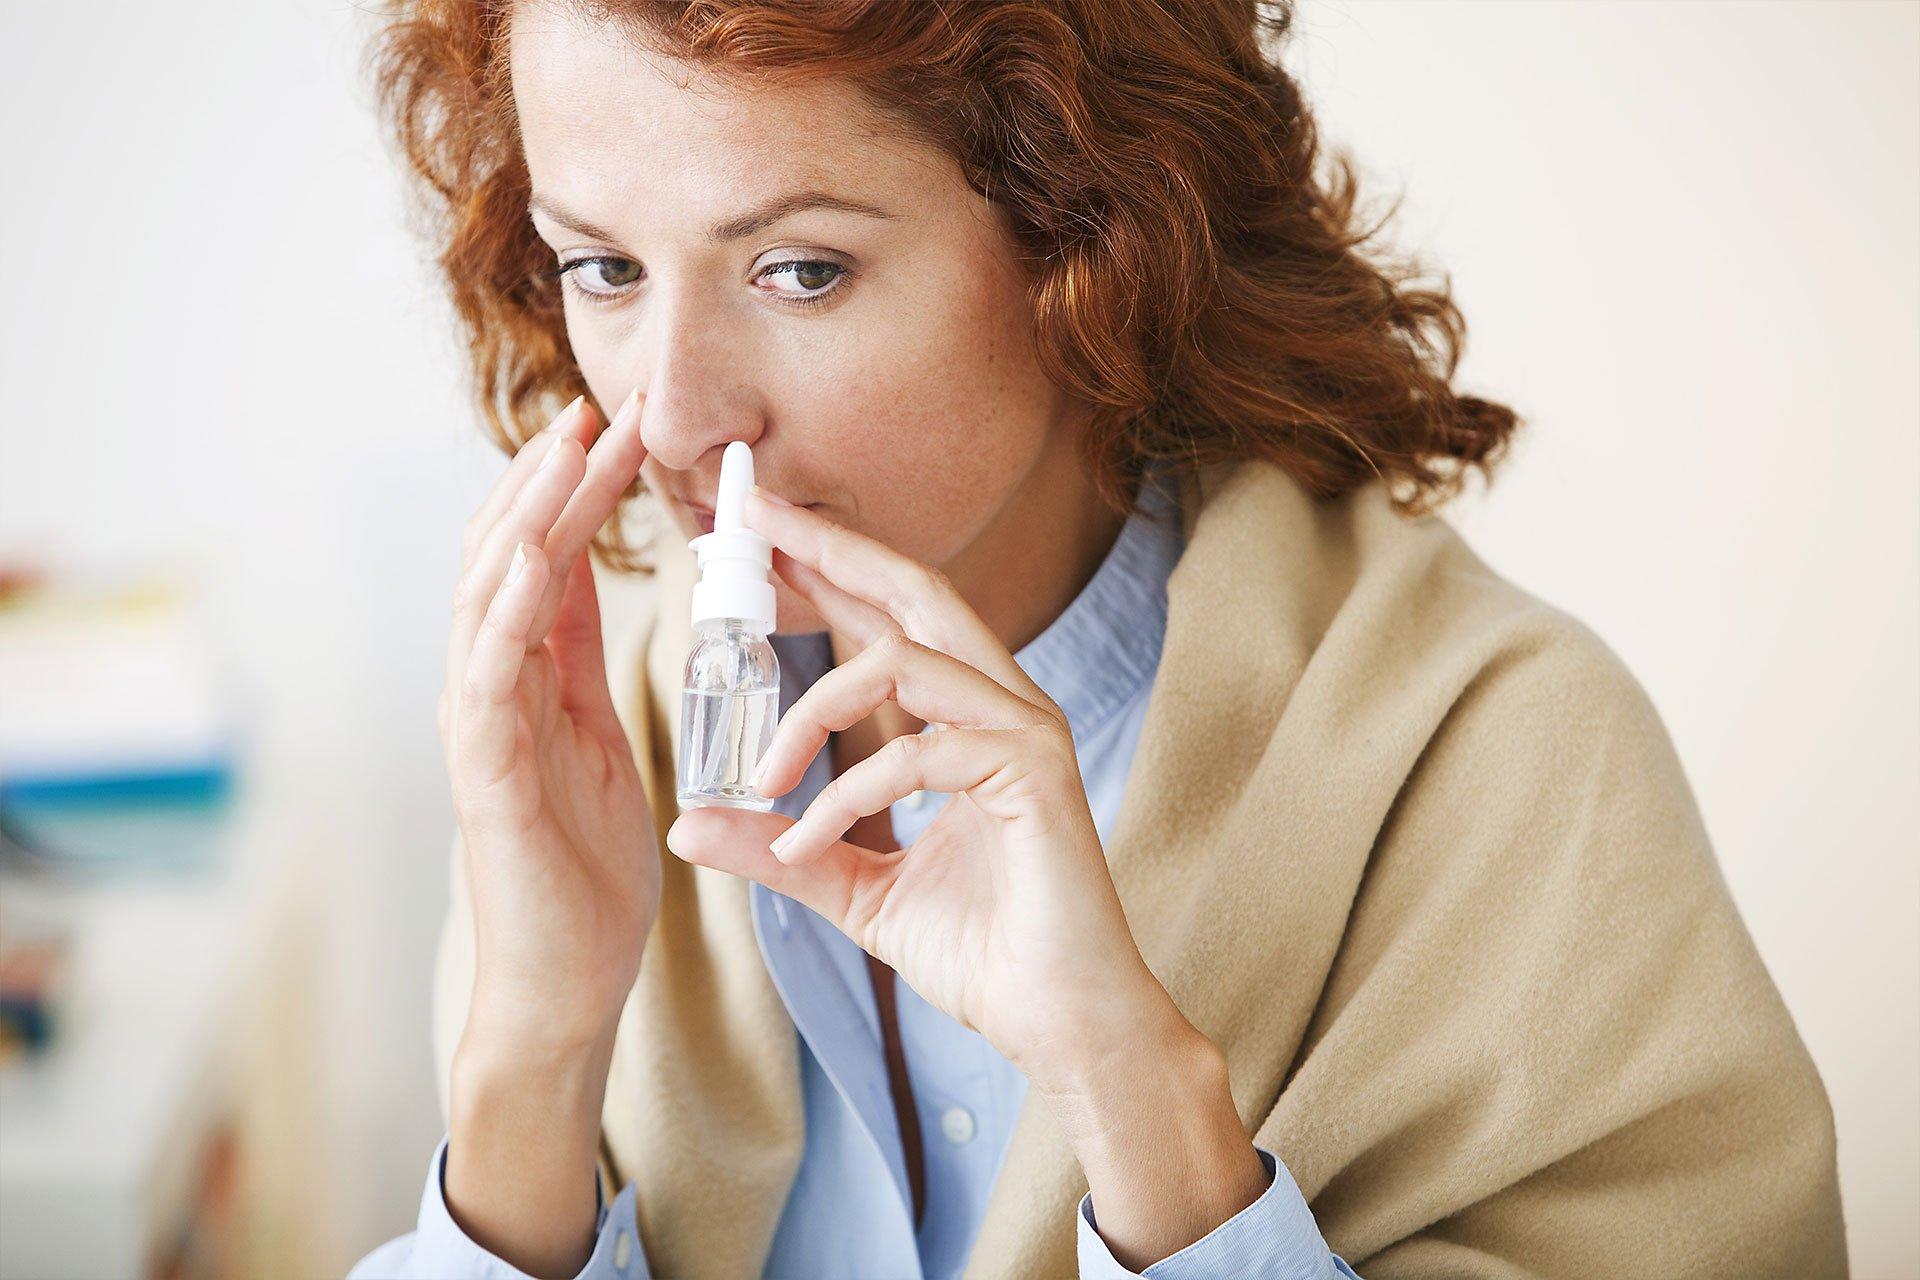 14_no-uso-decongestionati-nasali